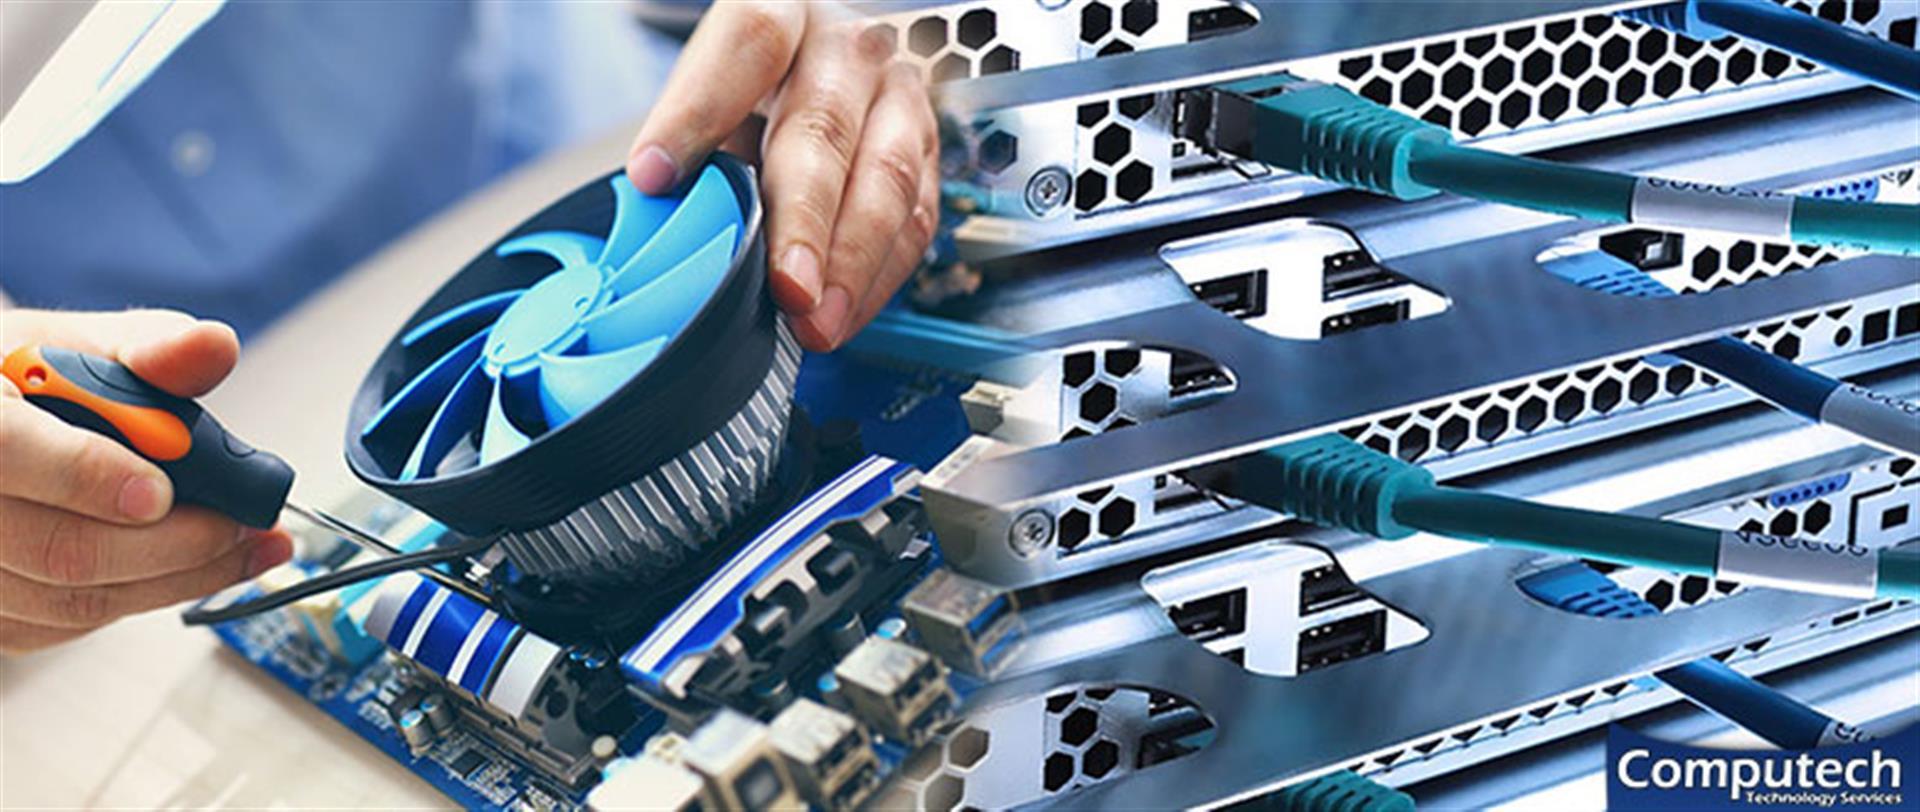 Virginia Beach Virginia Onsite Computer & Printer Repairs, Network, Voice & Data Cabling Contractors